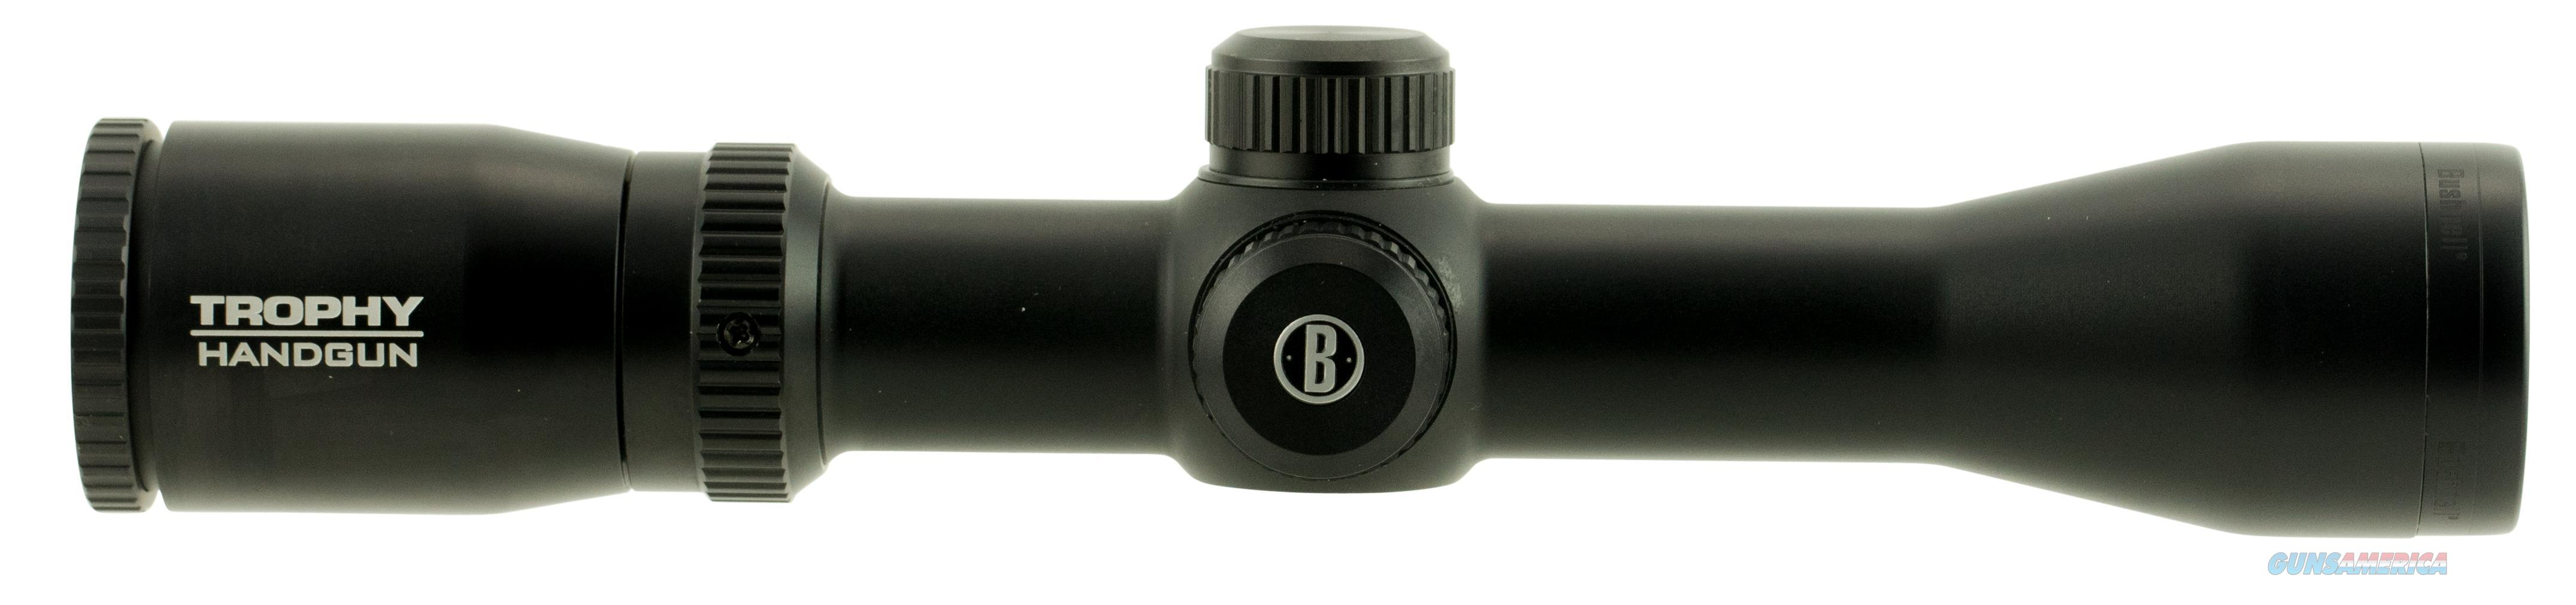 "Bushnell 752633 Trophy 2-6X 32Mm Obj 12-5 Ft @ 100 Yds Fov 1"" Tube Dia Black Matte Multi-X 752633  Non-Guns > Scopes/Mounts/Rings & Optics > Rifle Scopes > Variable Focal Length"